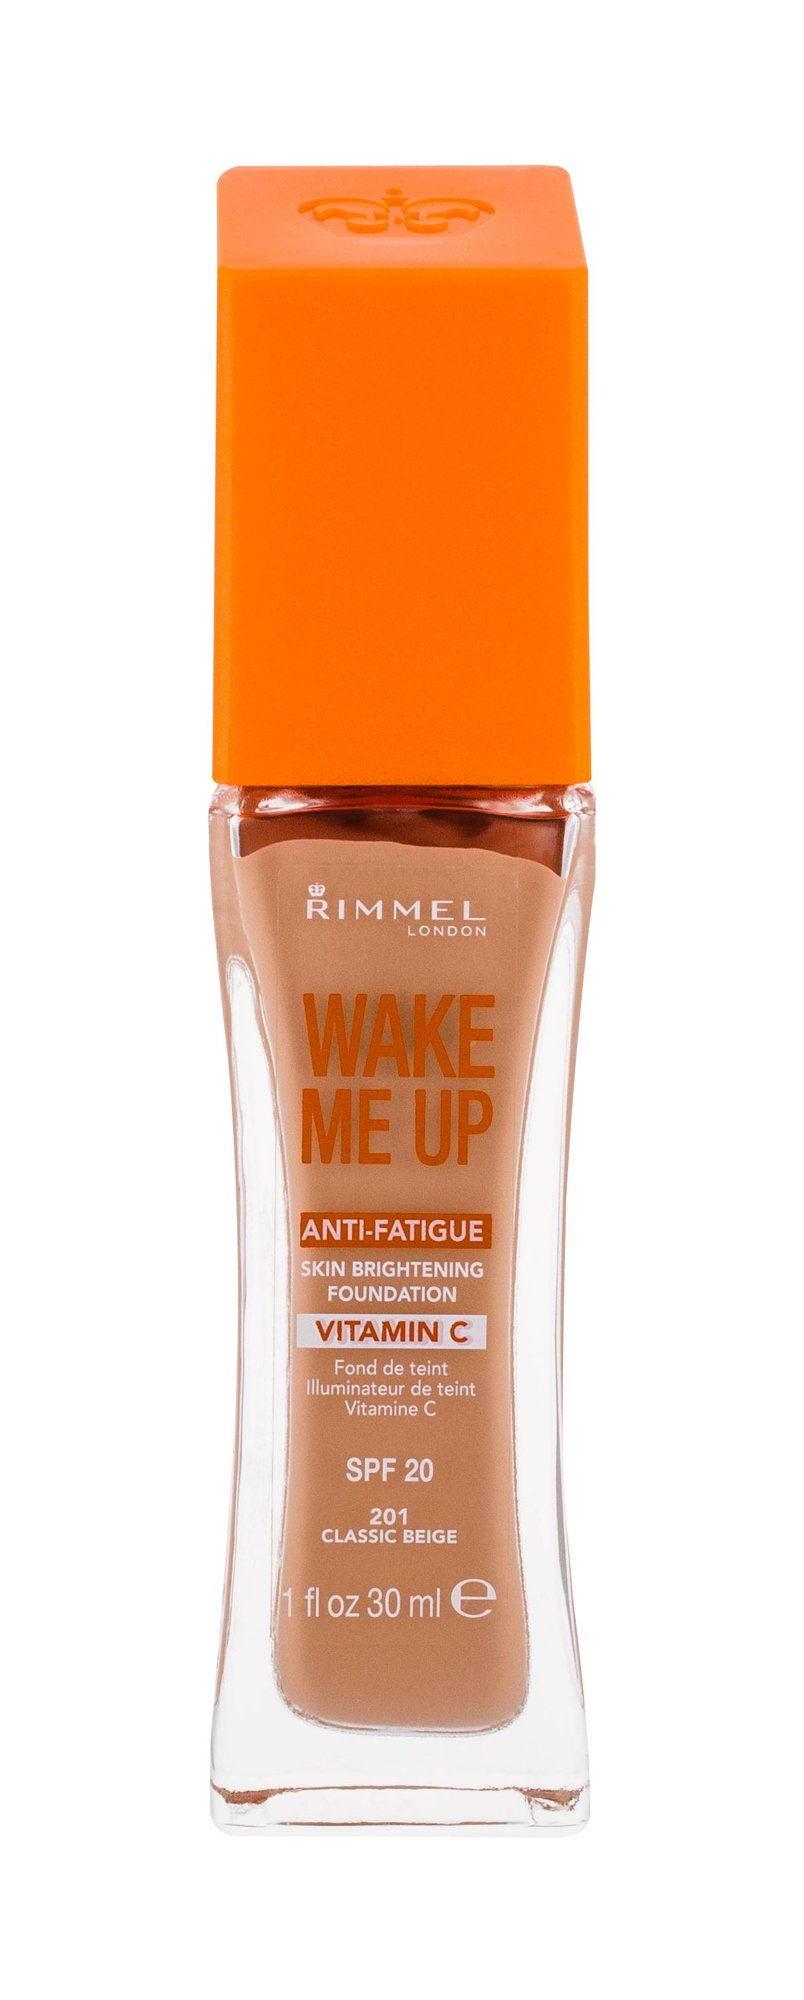 Rimmel London Wake Me Up Cosmetic 30ml 201 Classic Beige